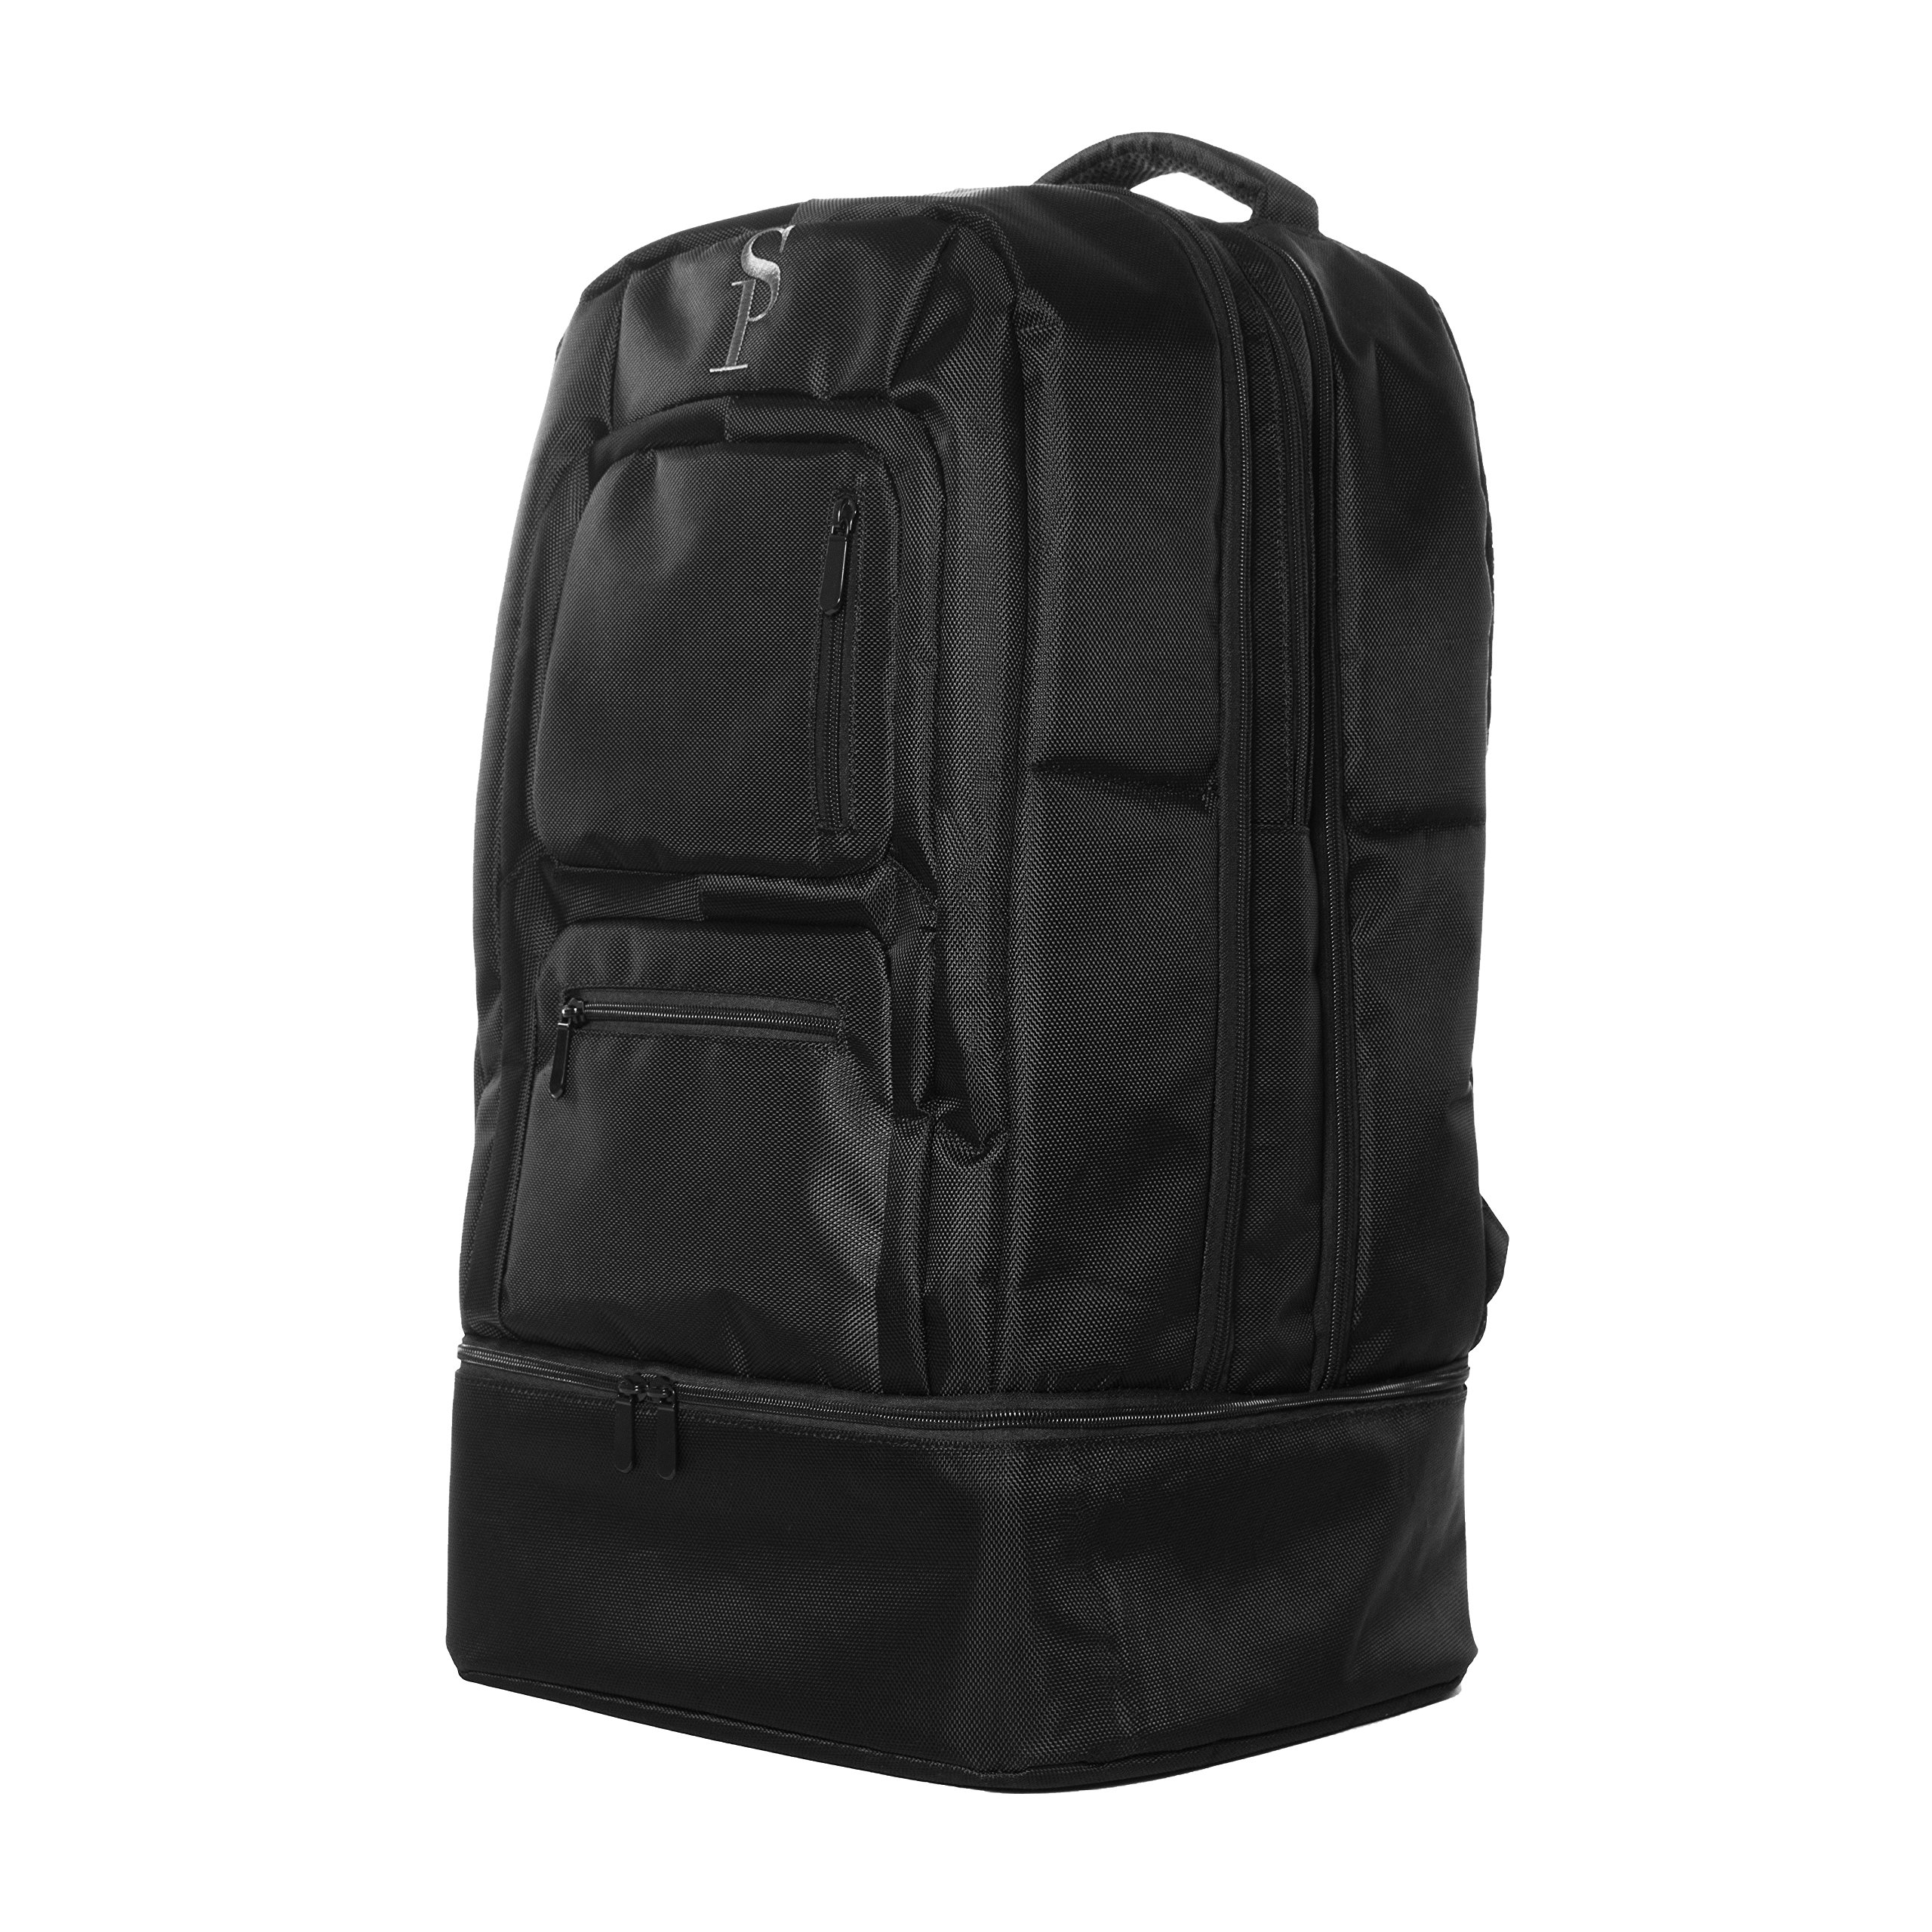 Sole Premise 笔记本电脑鞋随身行李旅行多功能运动鞋双肩包男女通用 黑色